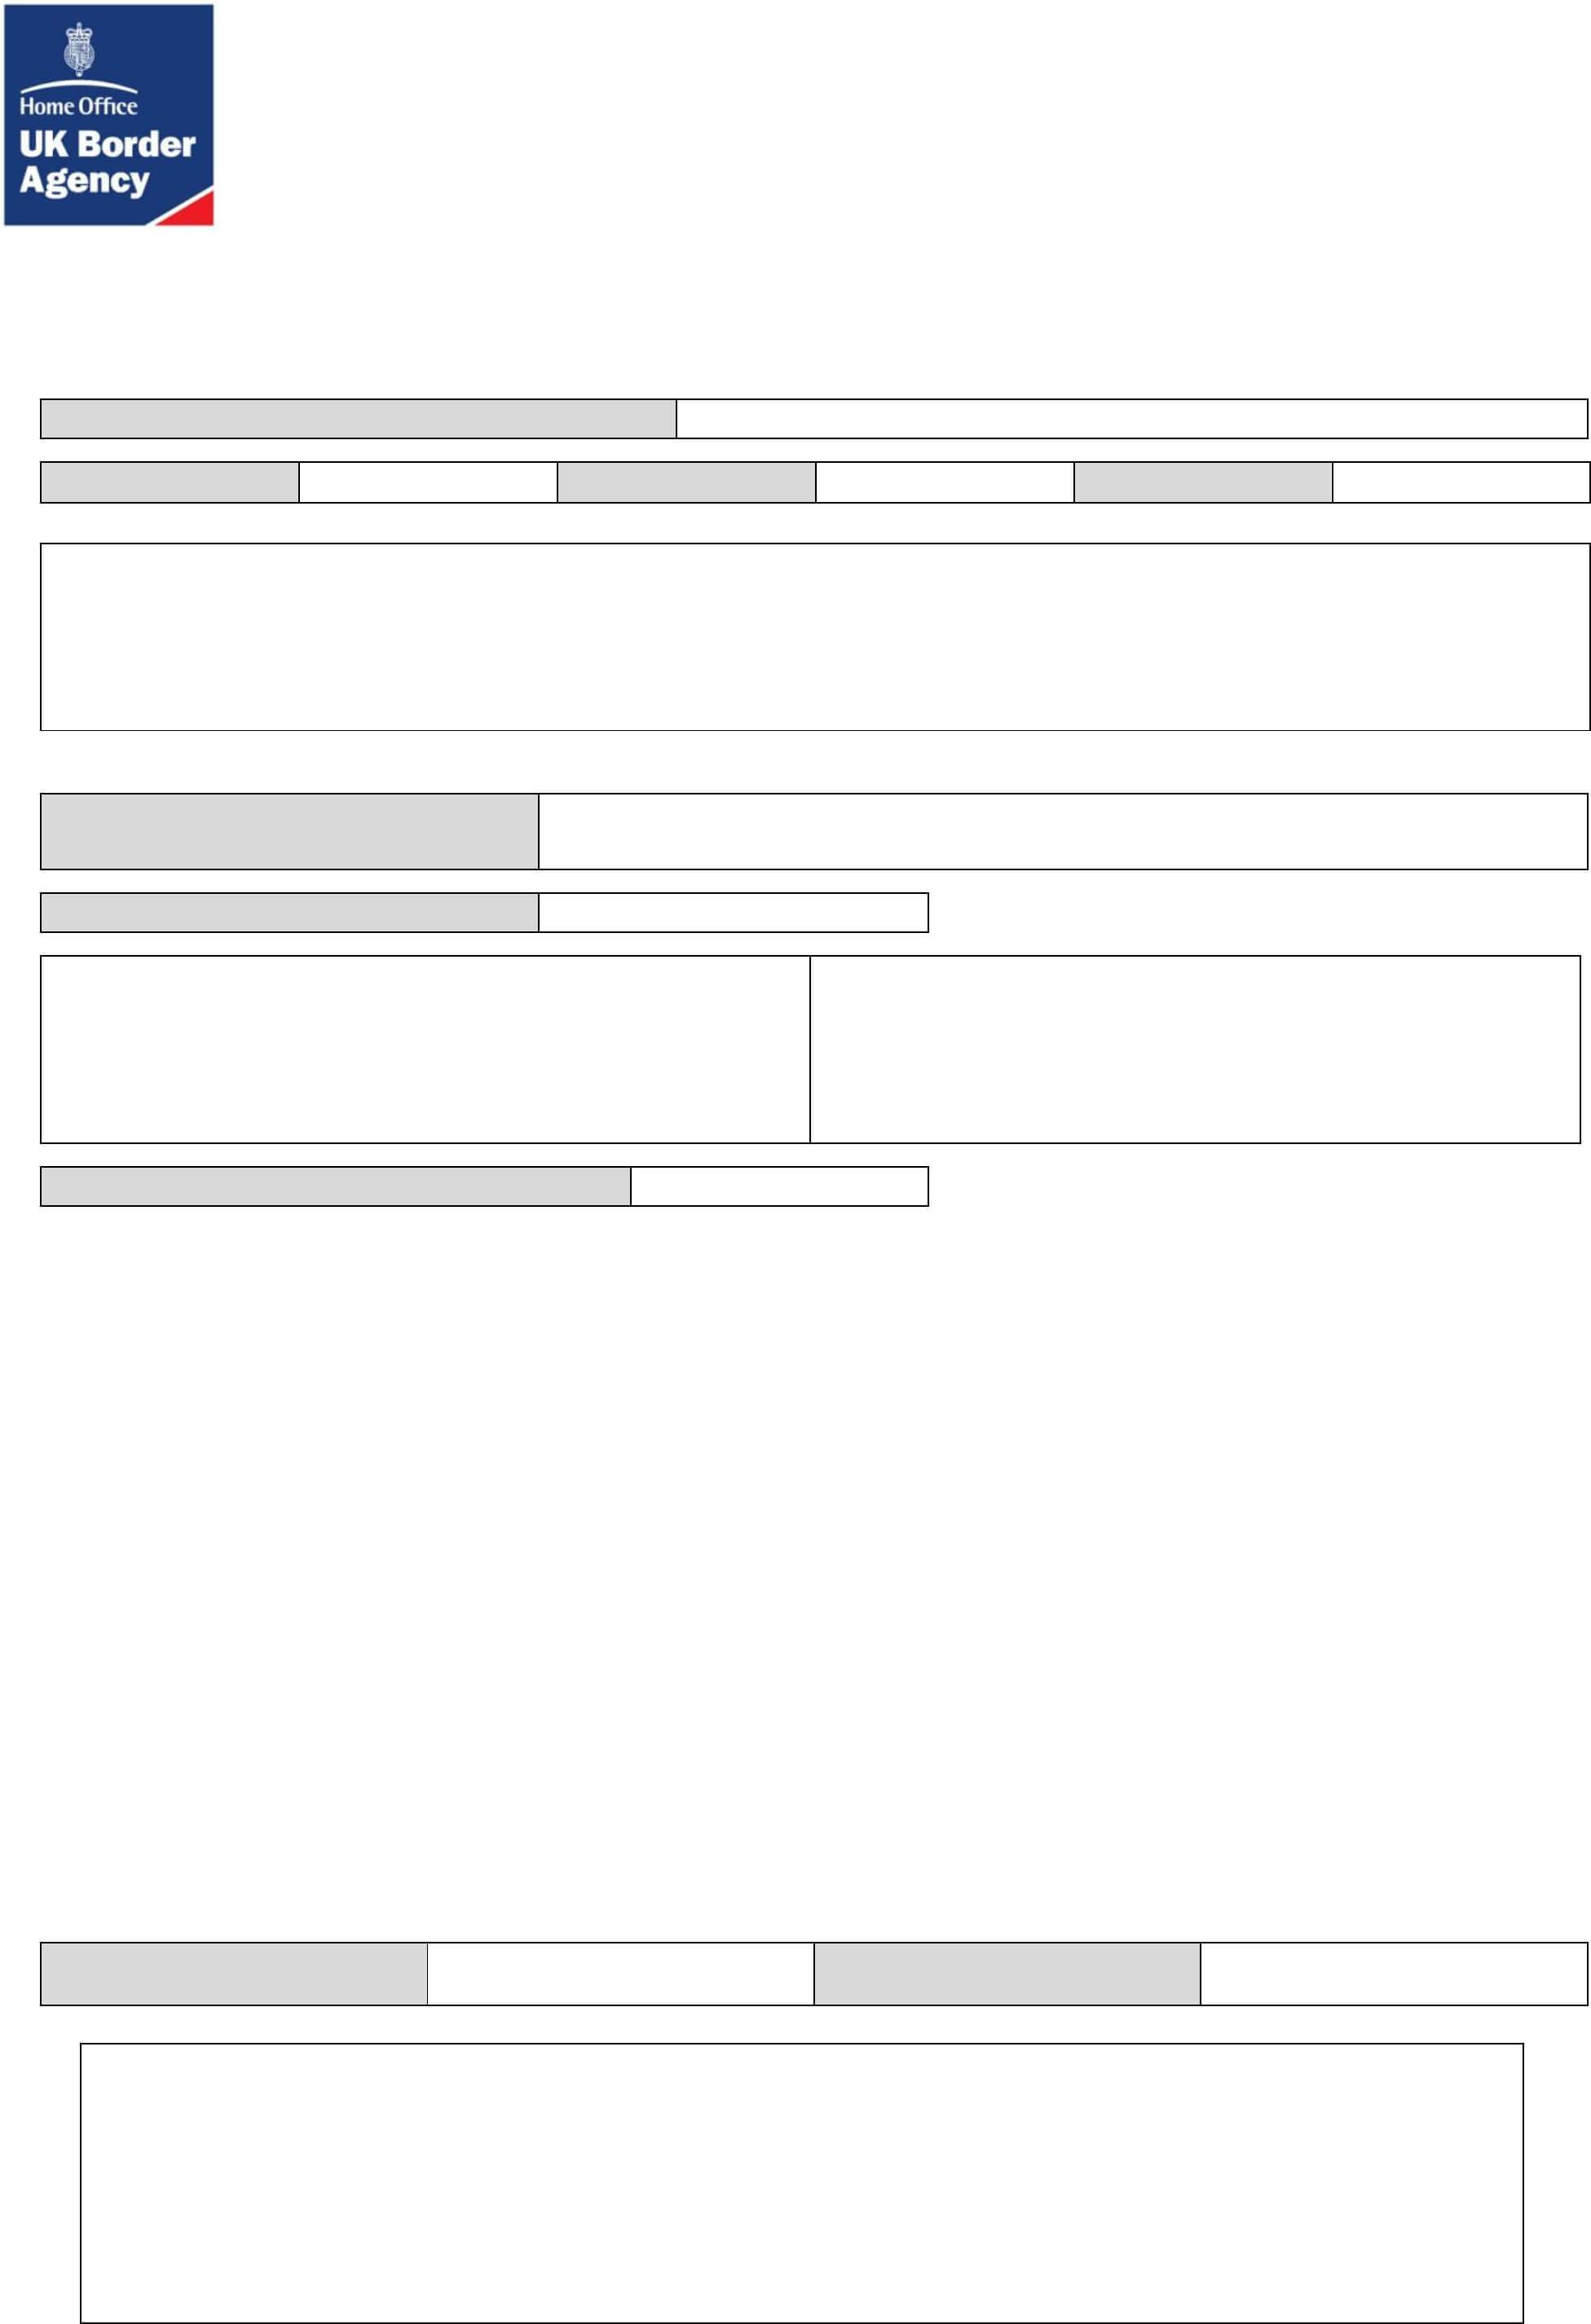 Sponsorship Undertaking Form - Uk Free Download within Blank Sponsor Form Template Free